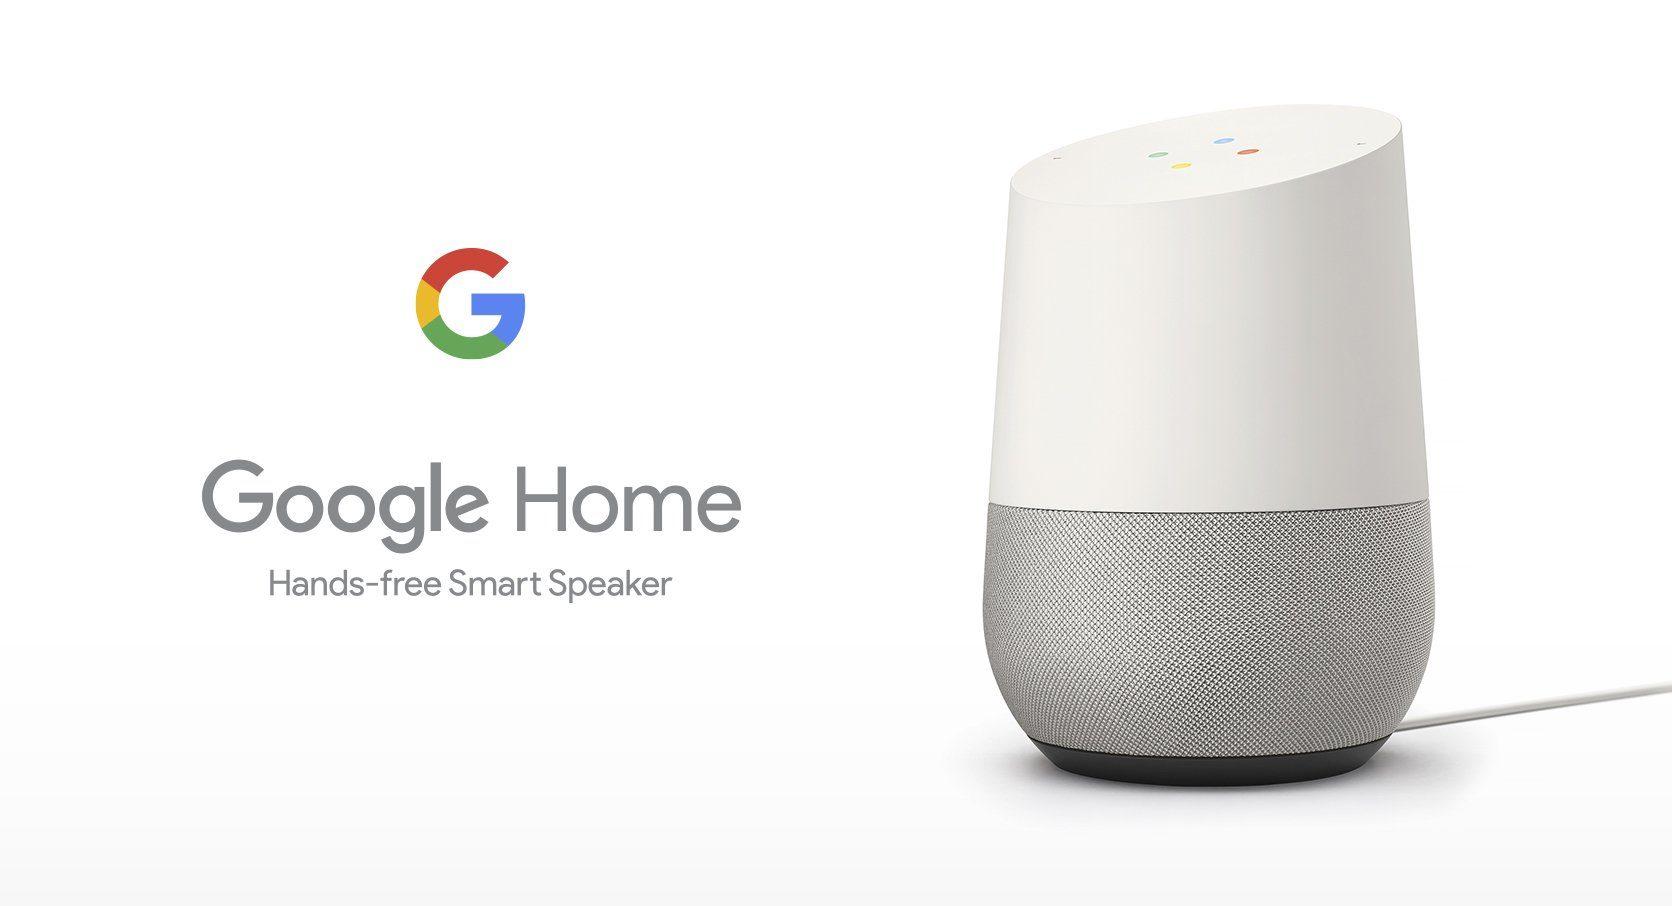 google home kaufen smarter lautsprecher mit google. Black Bedroom Furniture Sets. Home Design Ideas